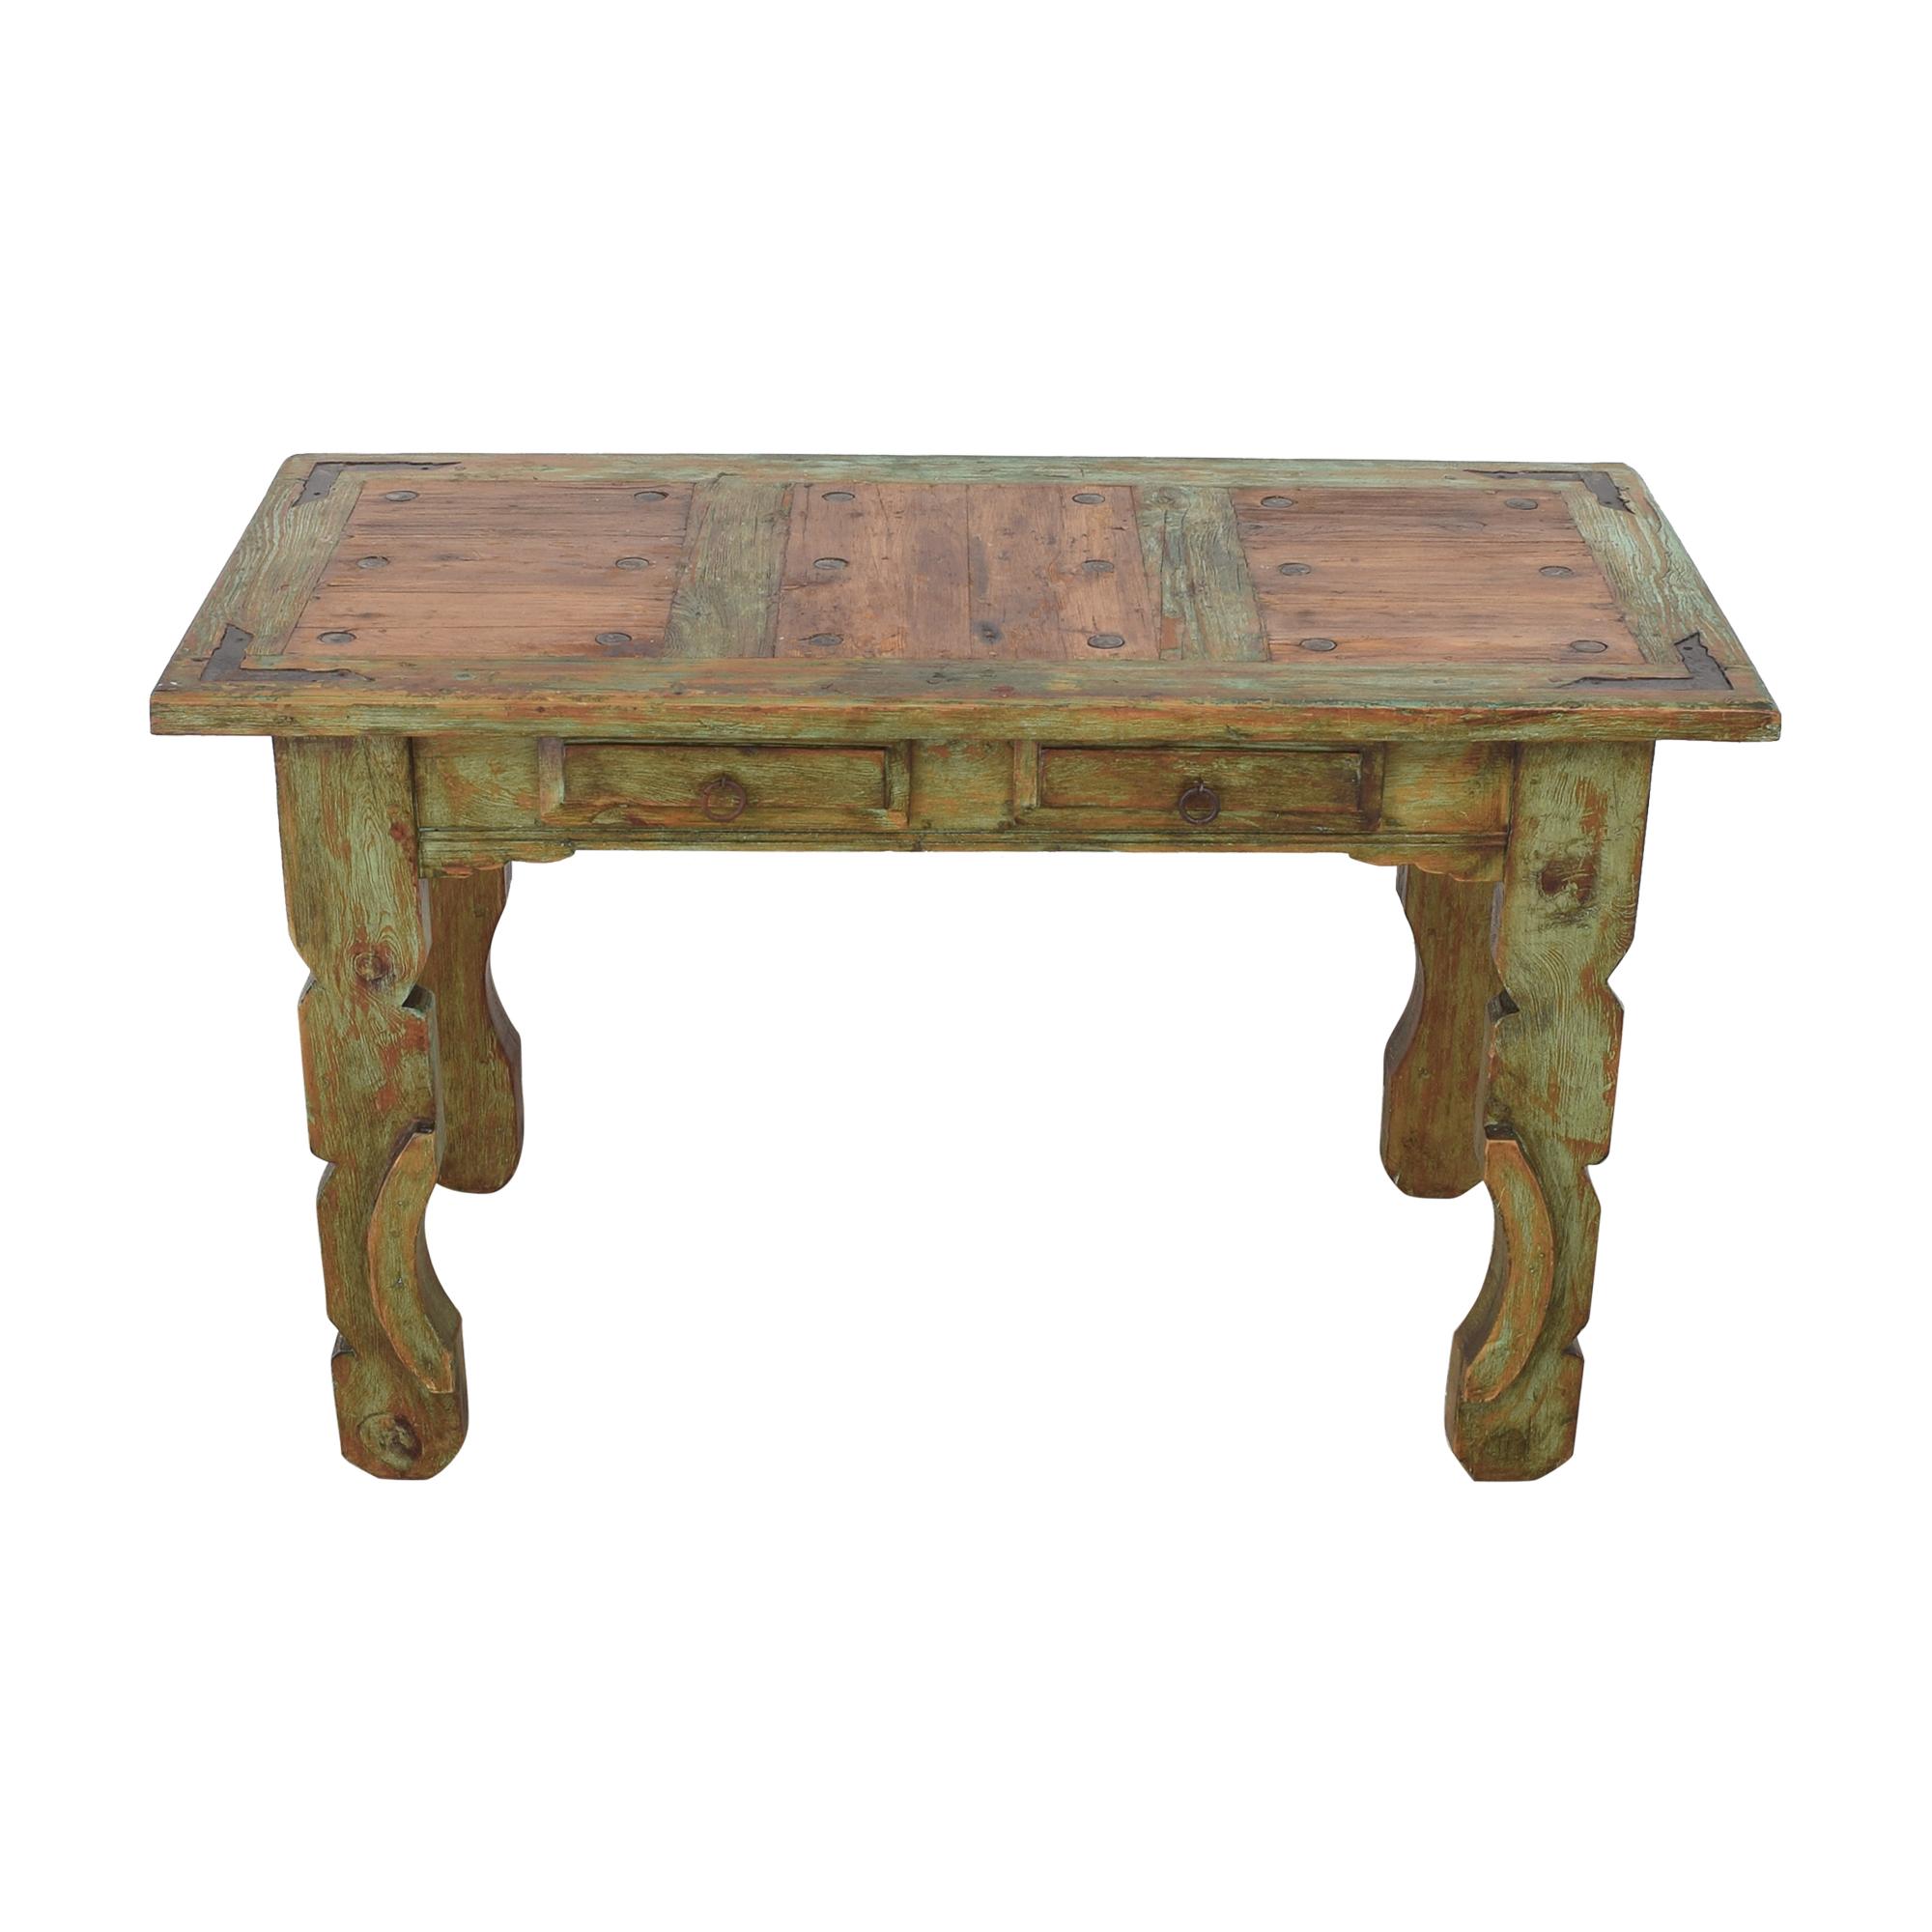 El Barzon Rustic Furniture El Barzon Rustic Furniture Reclaimed Dining Table  ct